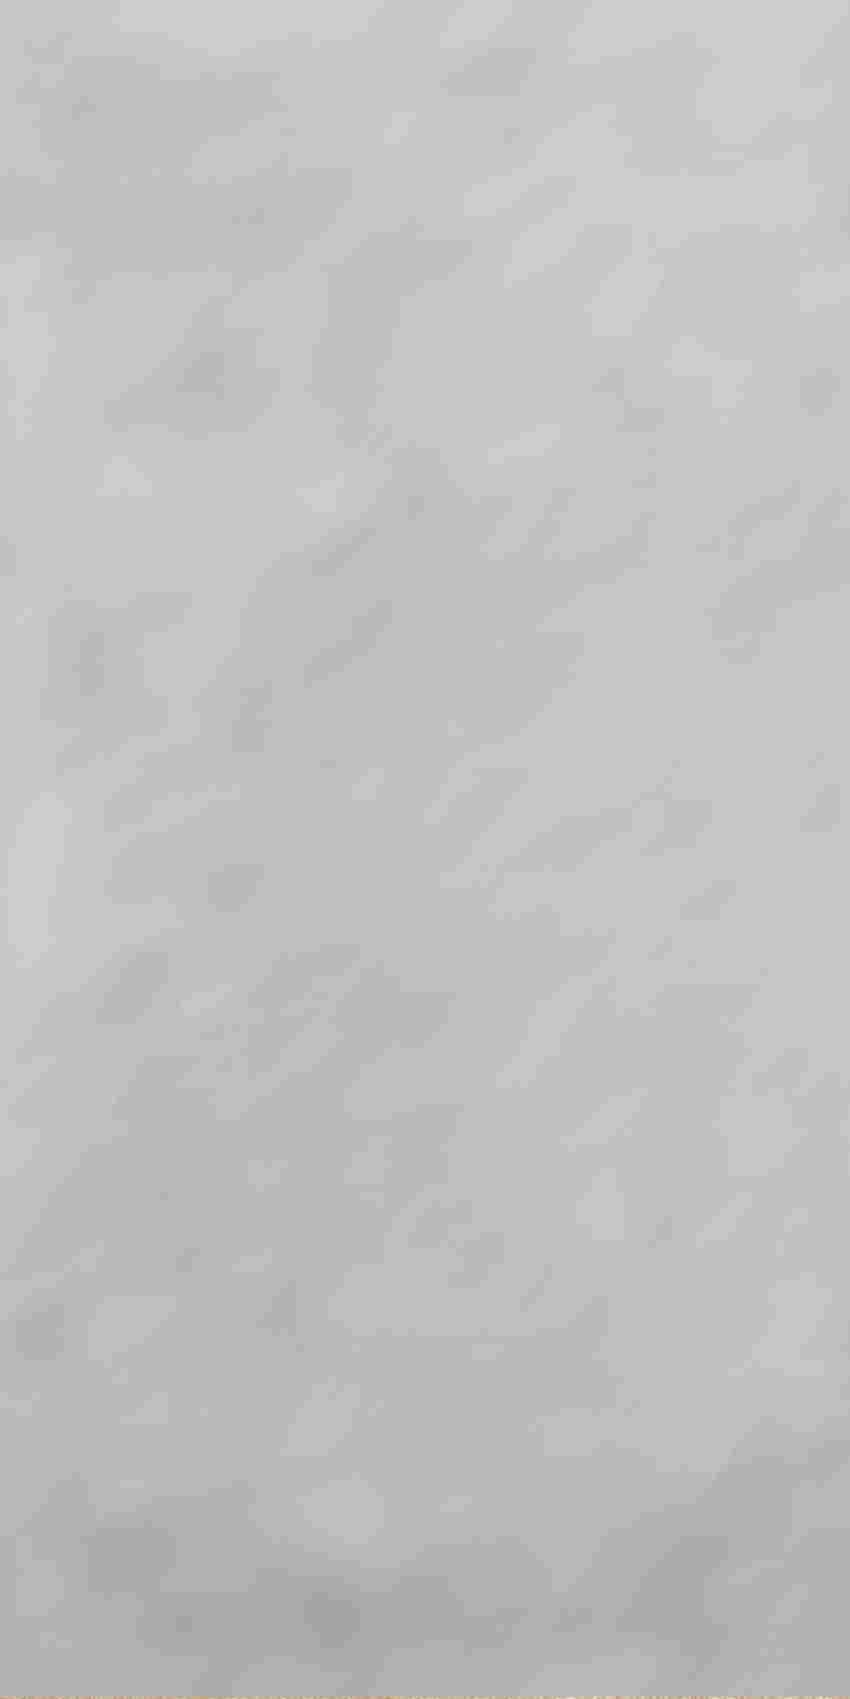 Płytka uniwersalna 30x60 cm Paradyż Flash Beige Gres Szkl. Mat